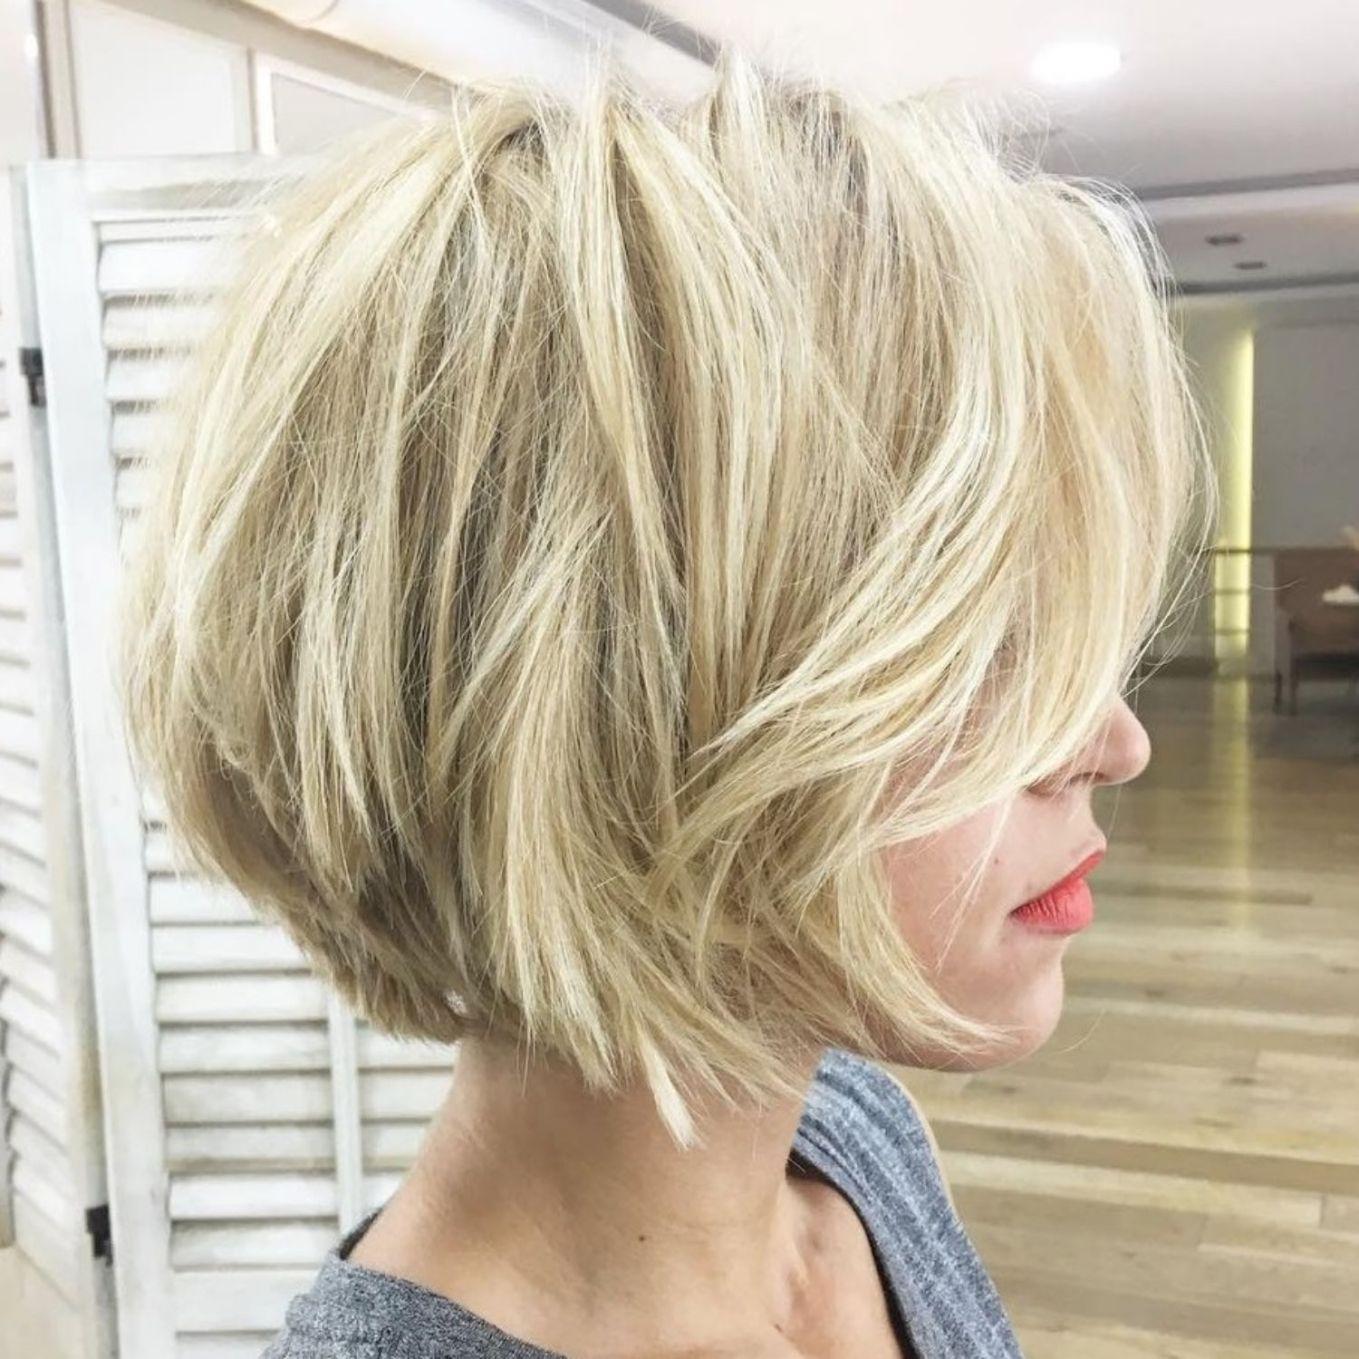 100 Mind Blowing Short Hairstyles For Fine Hair Kapsels Bob Kapsel Halflang Bob Kapsel Grijs Haar